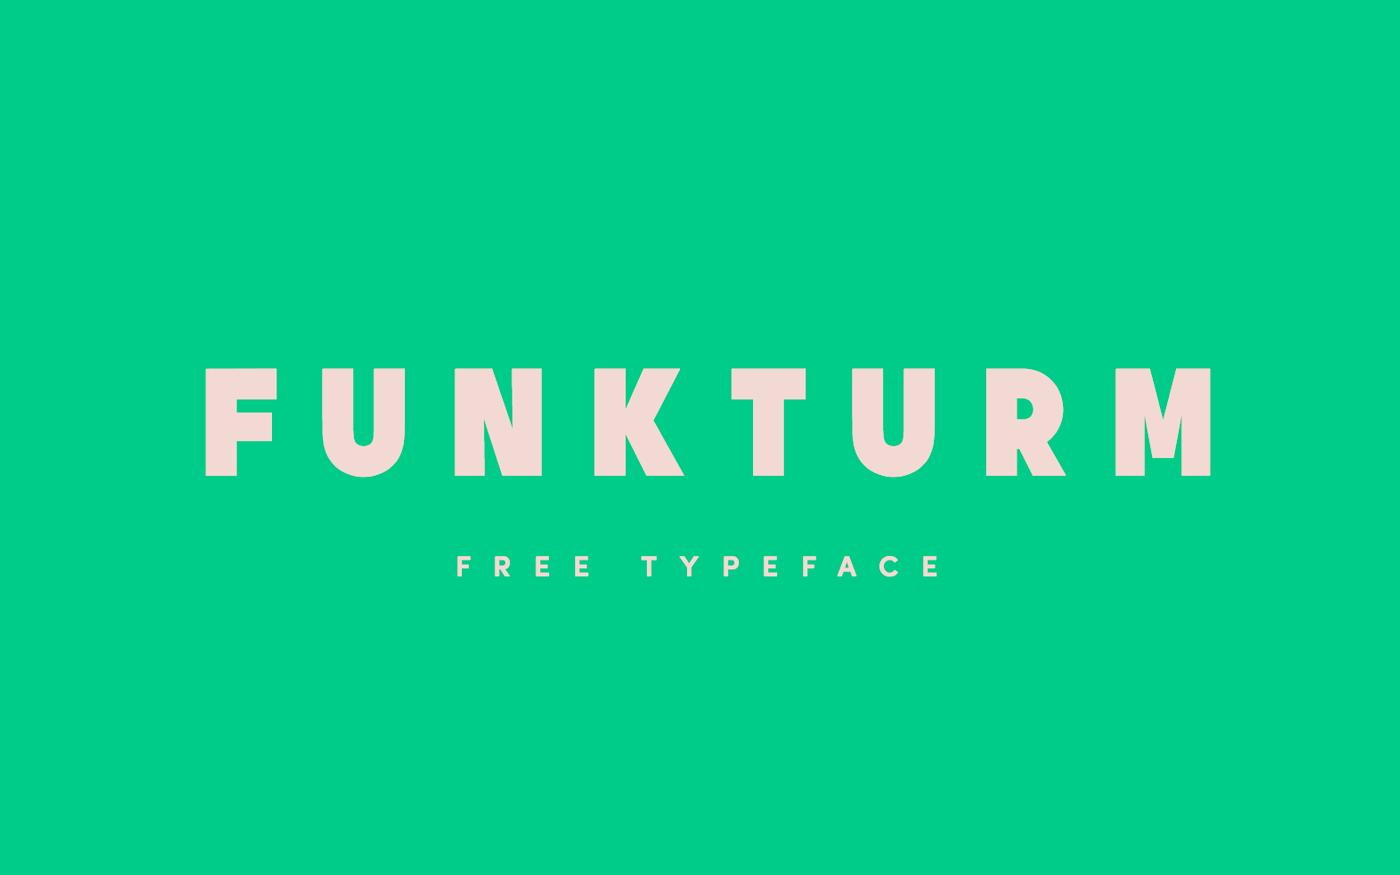 Free Download: Funkturm Typeface